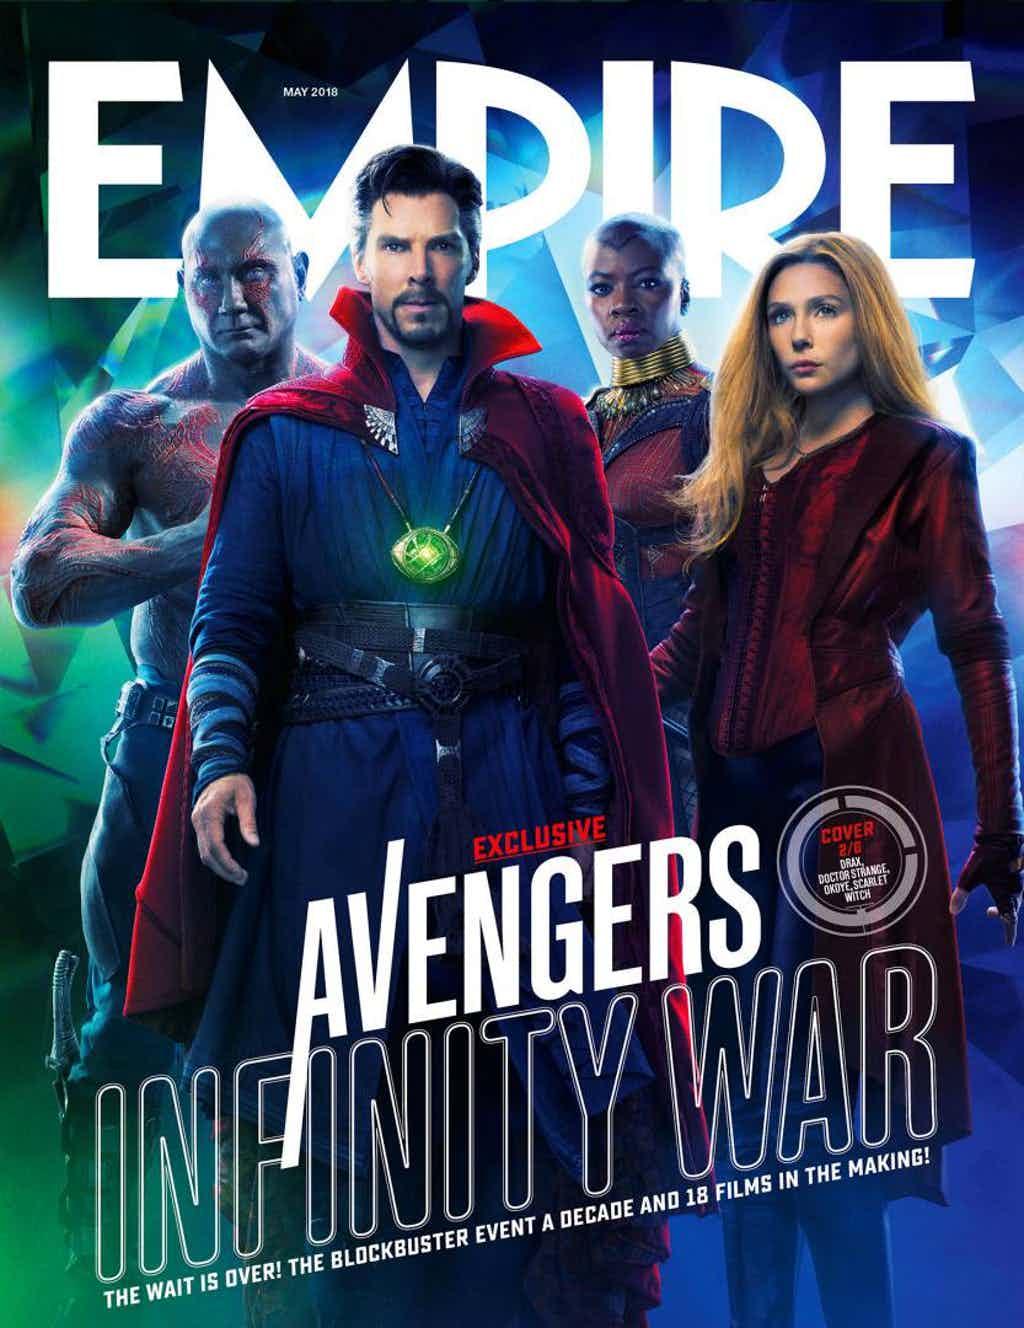 szmk_avengers_bosszuallok_infinity_war_vegtelen_haboru_marvel_empire_6.jpg